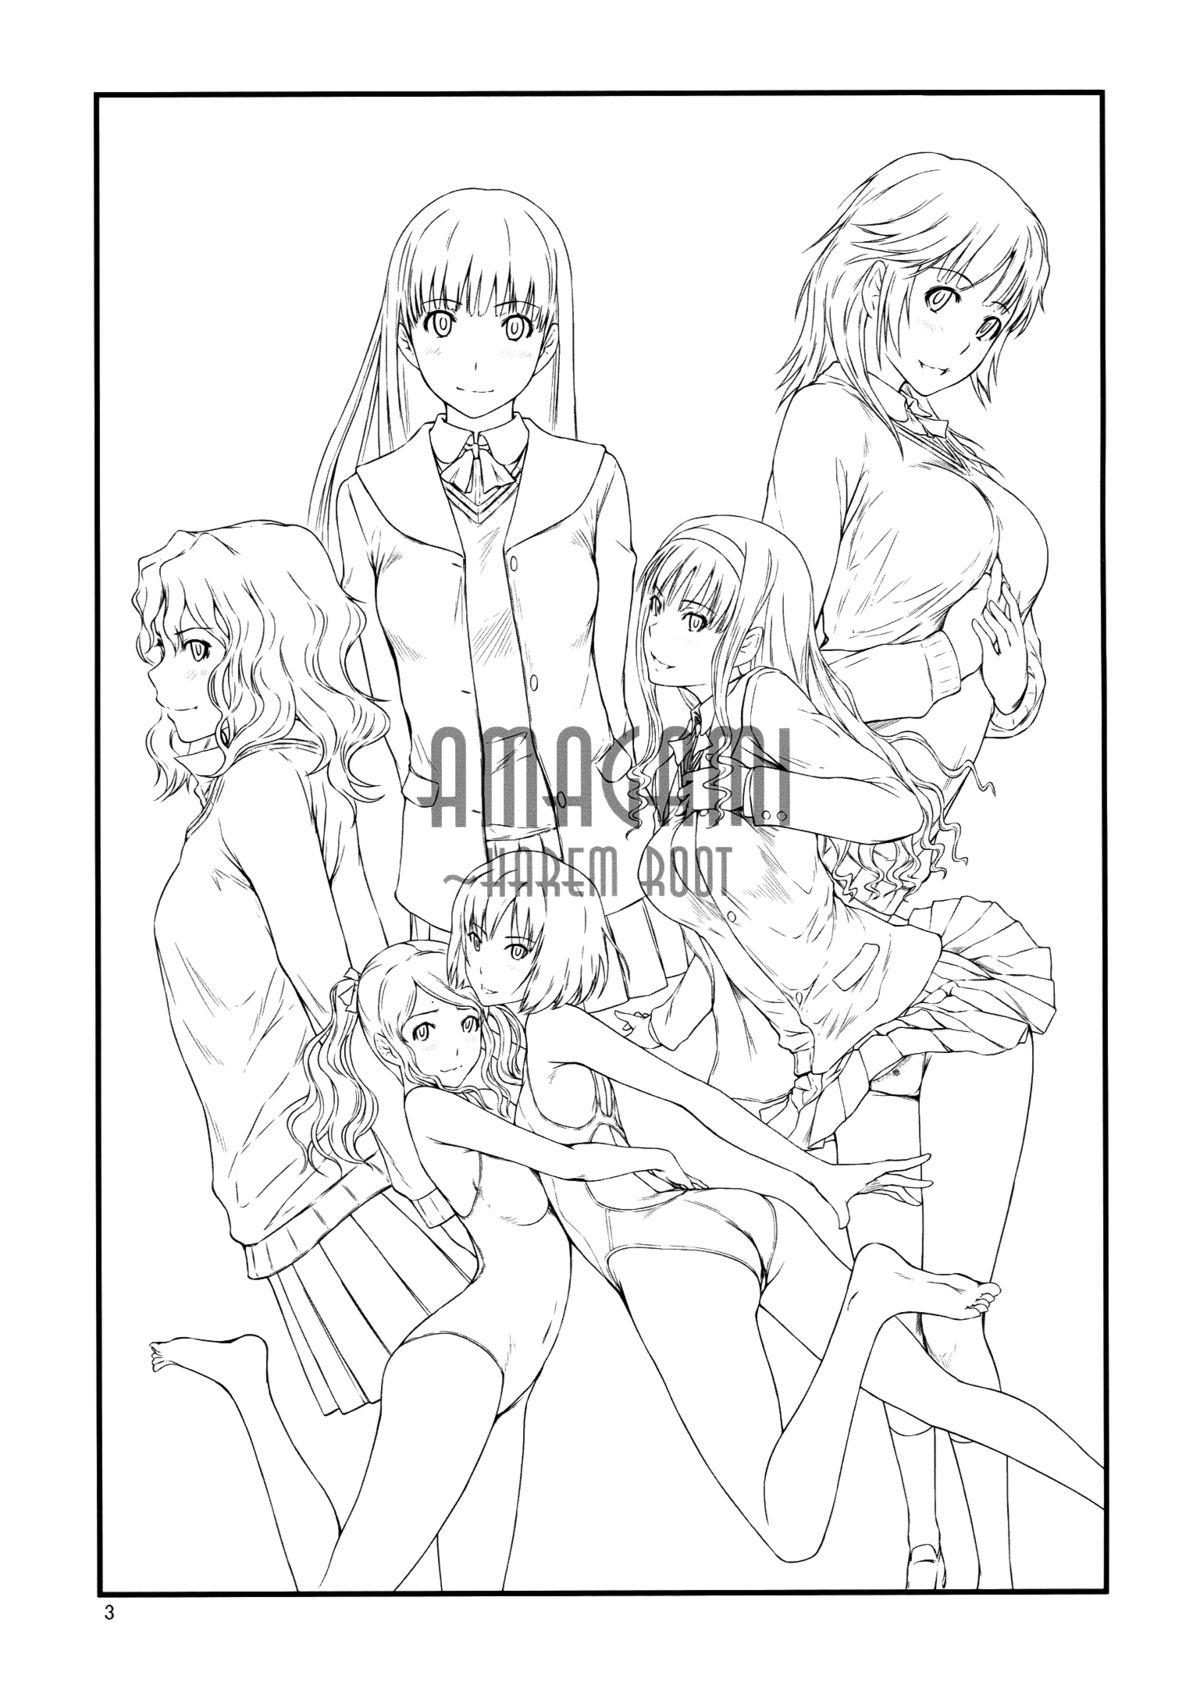 AMAGAMI ~HAREM ROOT 2